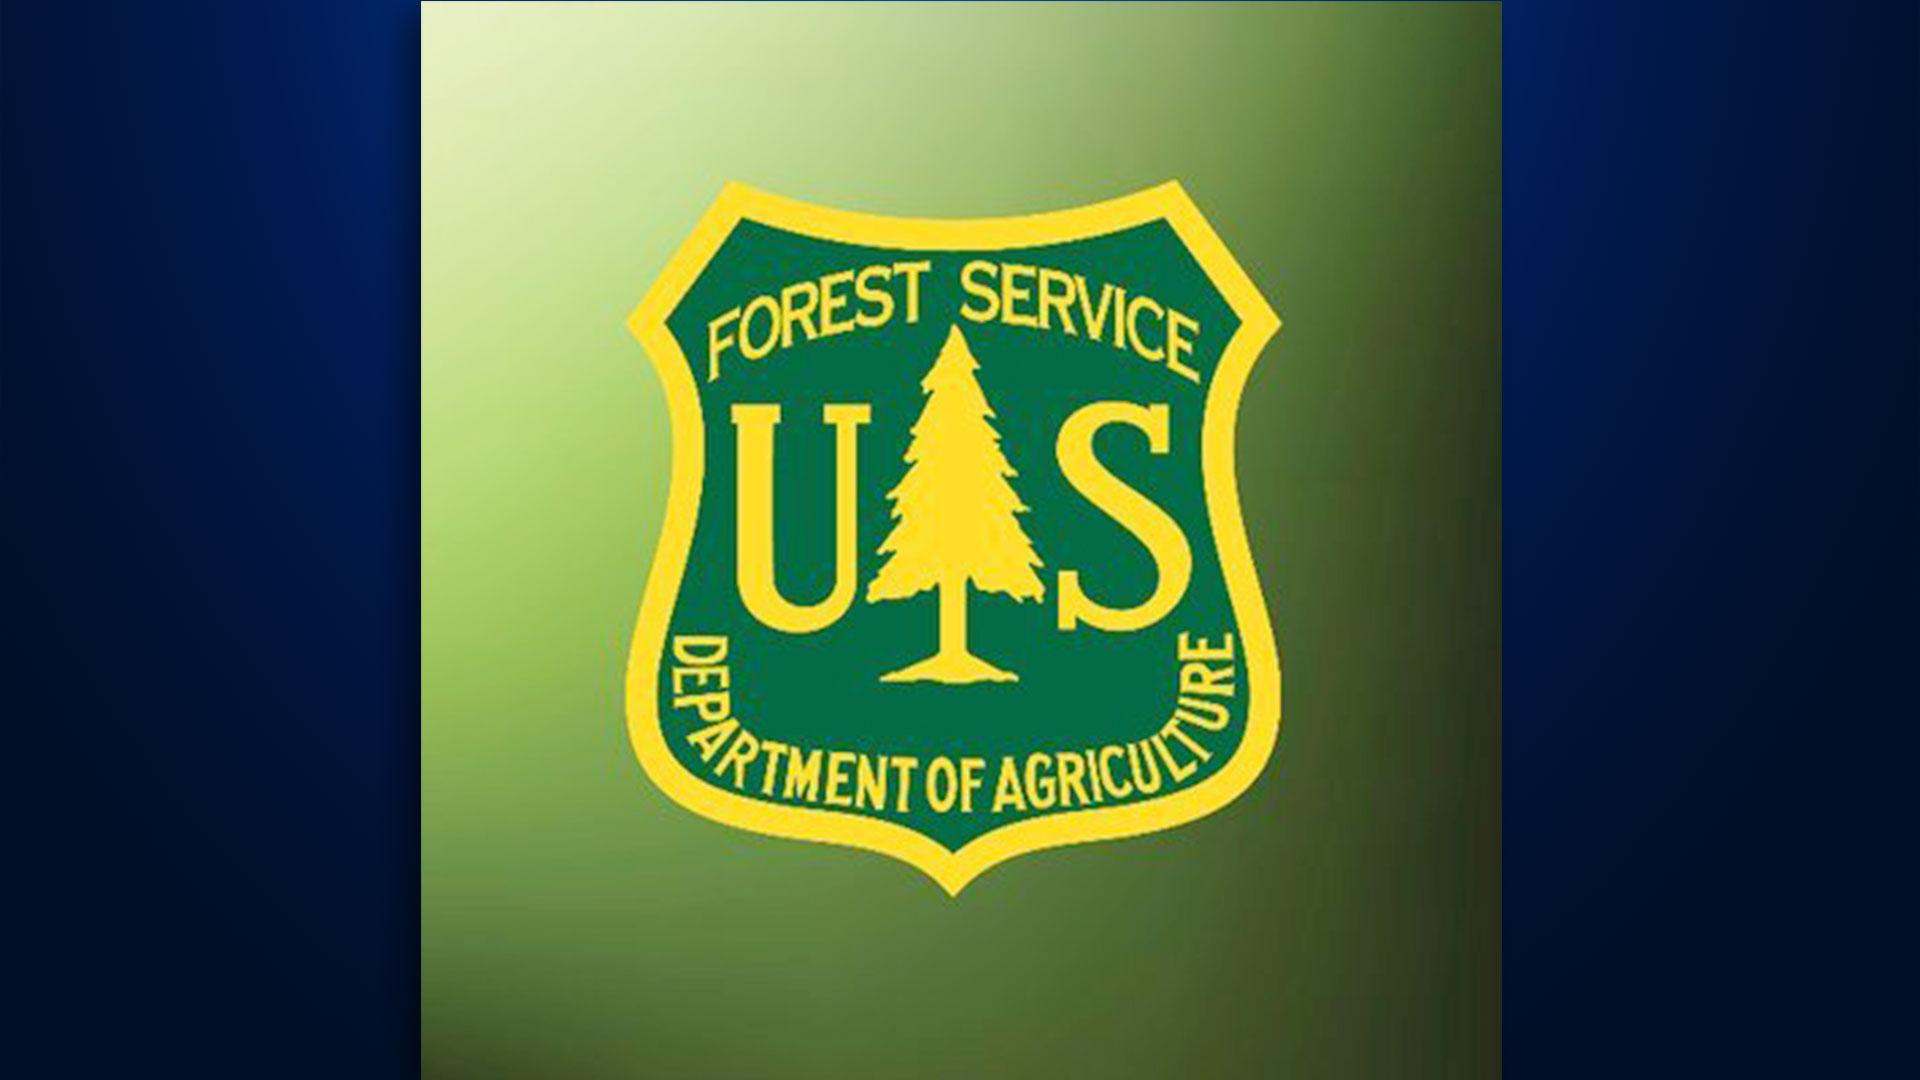 KELO Forest Service